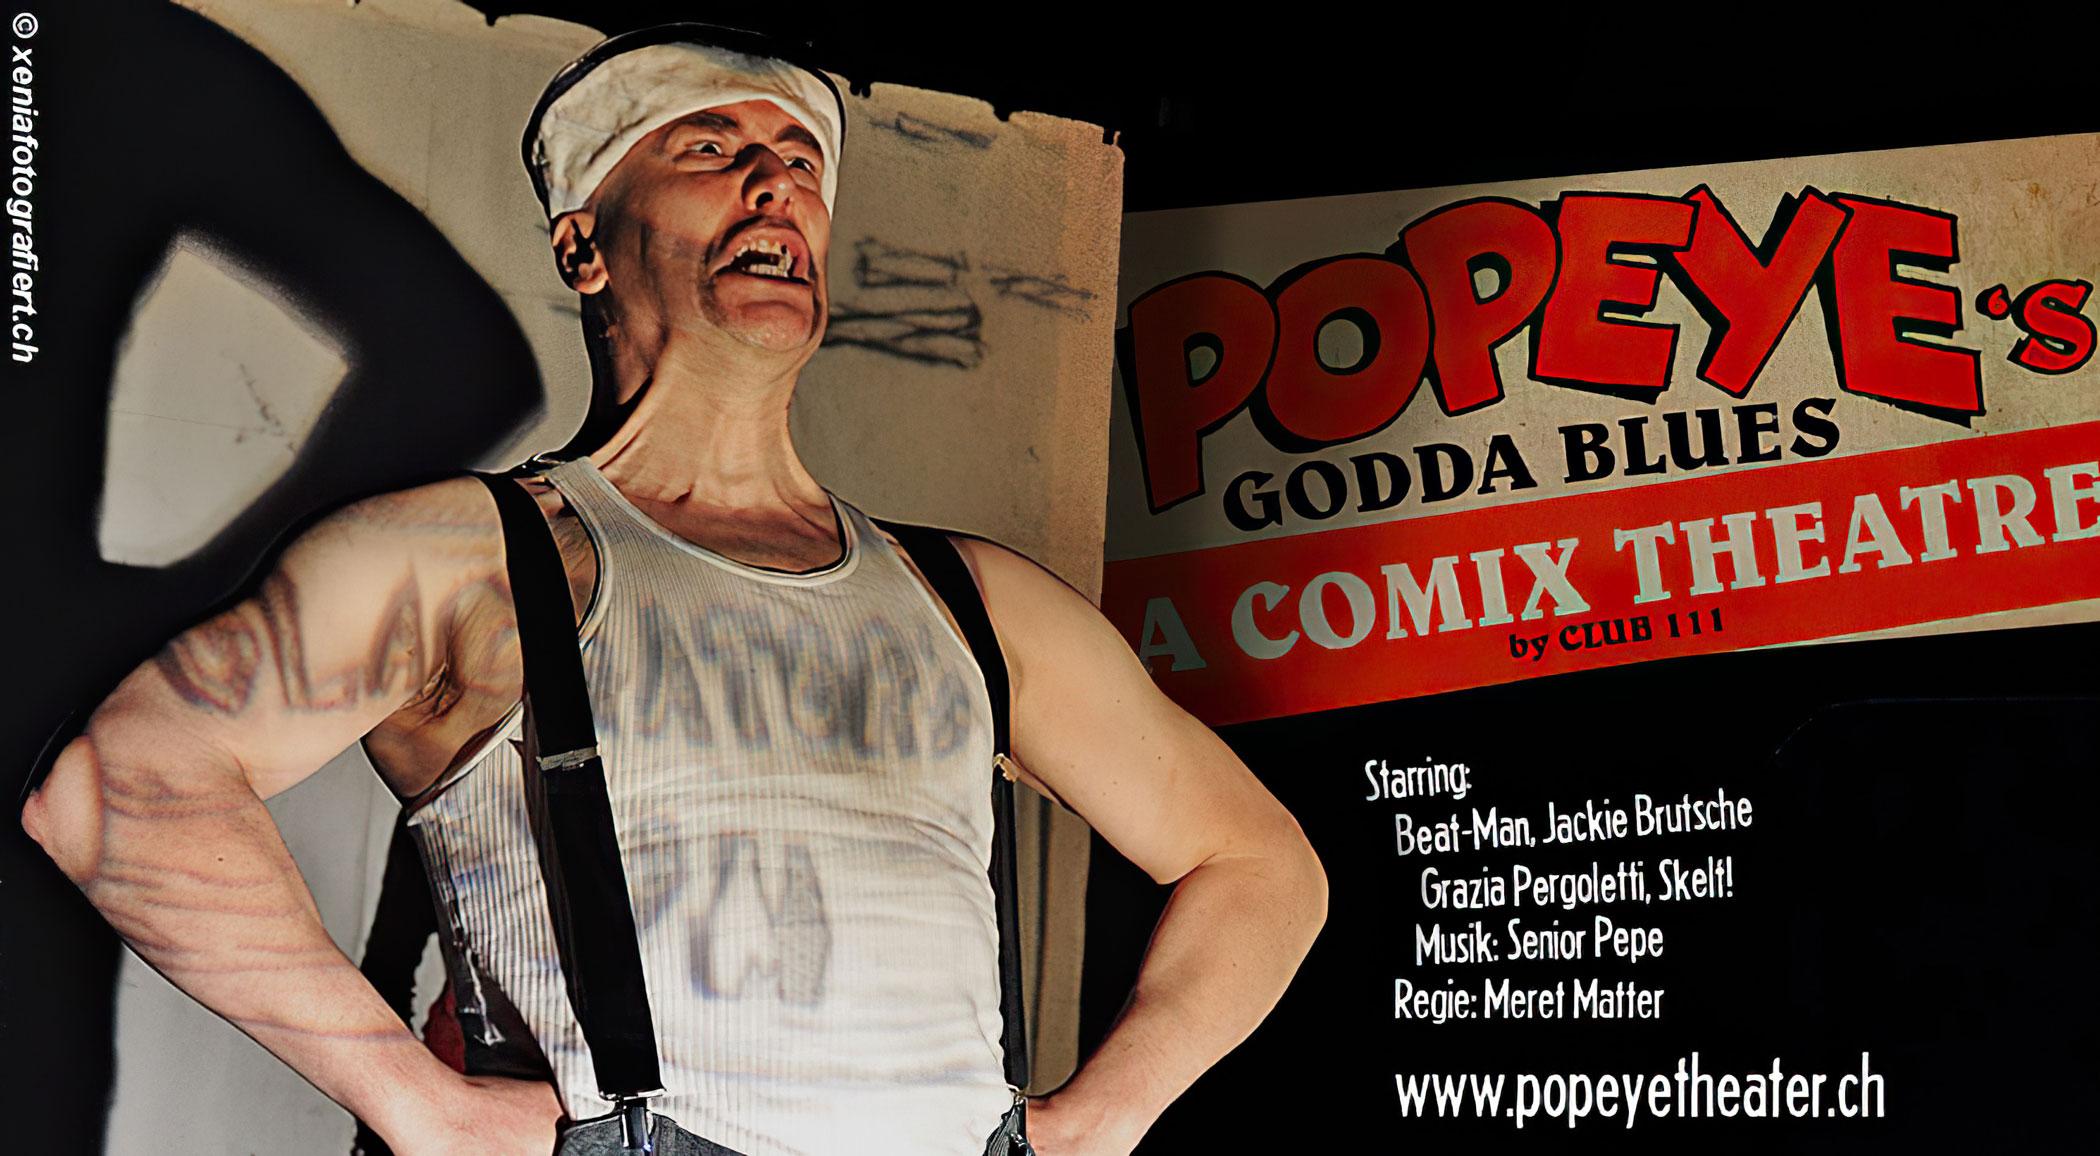 Popeye Comix Theatre